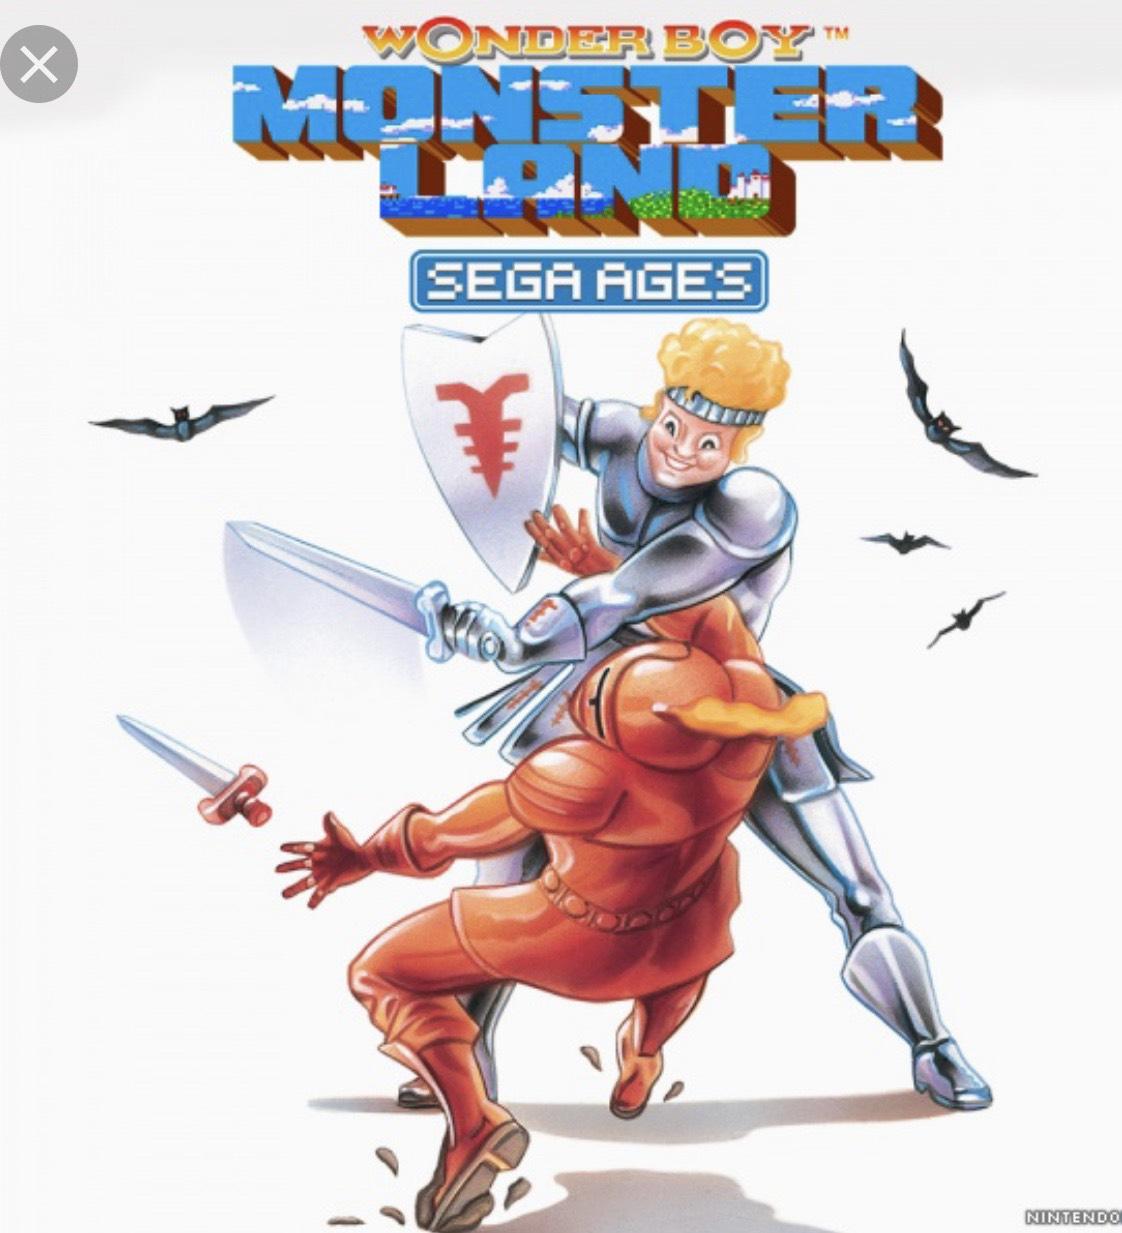 SEGA AGES Wonder Boy: Monster Land and Gain Ground (Nintendo Switch) £4.01 each @ Nintendo eShop